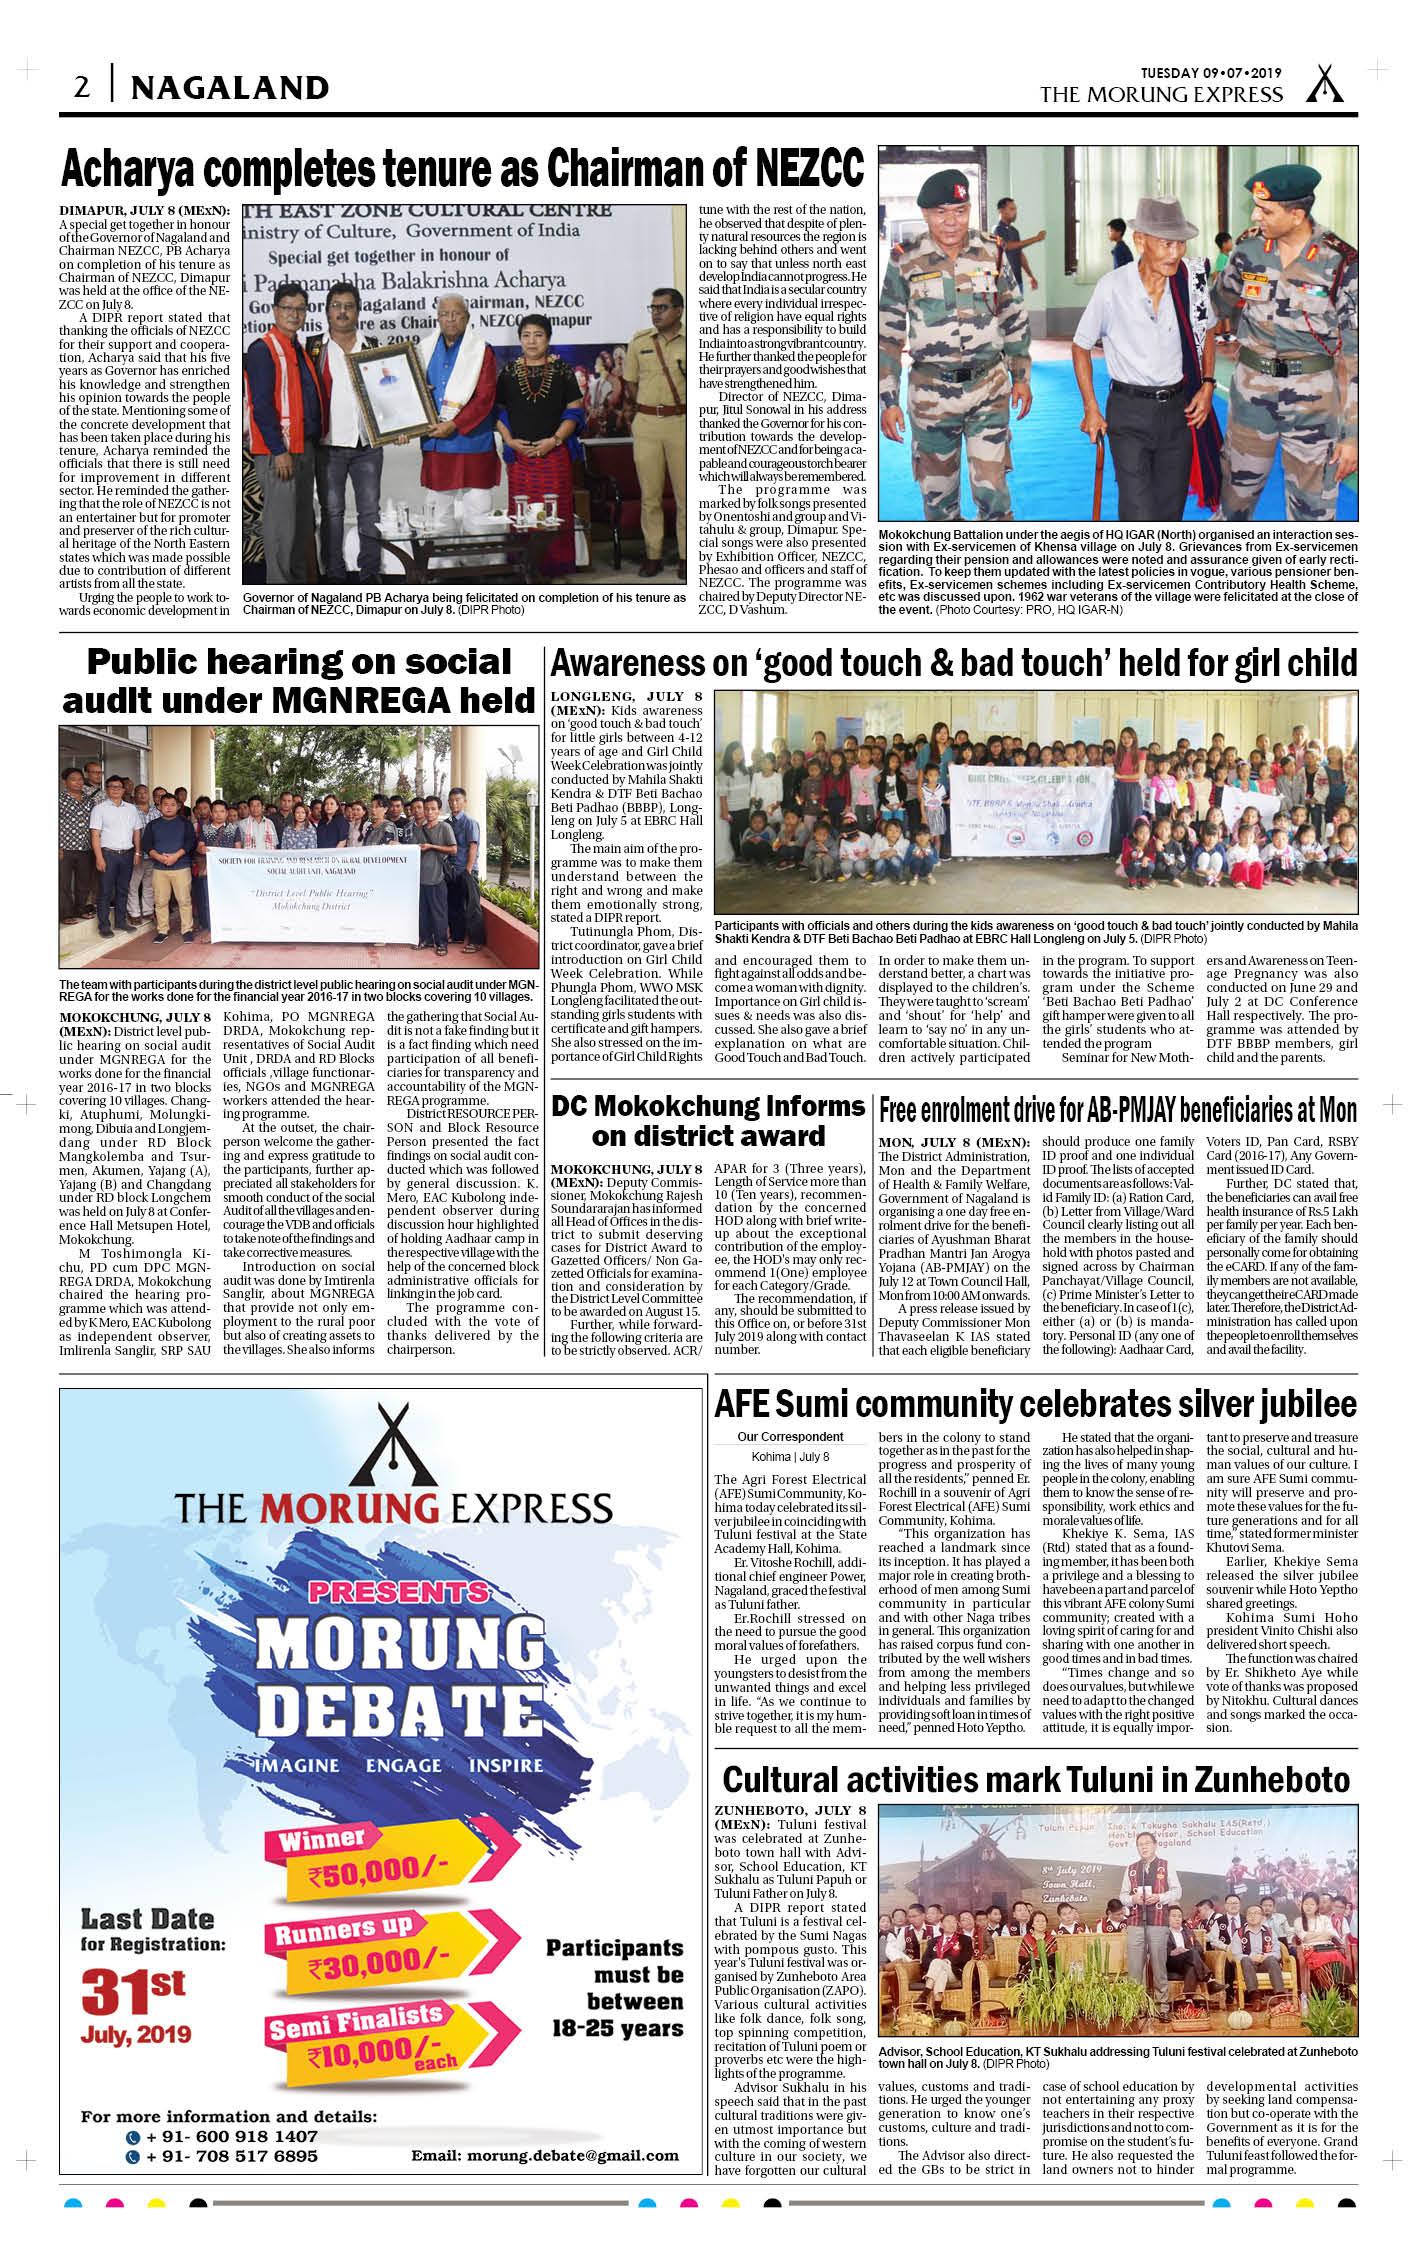 July 9, 2019 Page: 2 - The Morung Express E-Paper - Morung